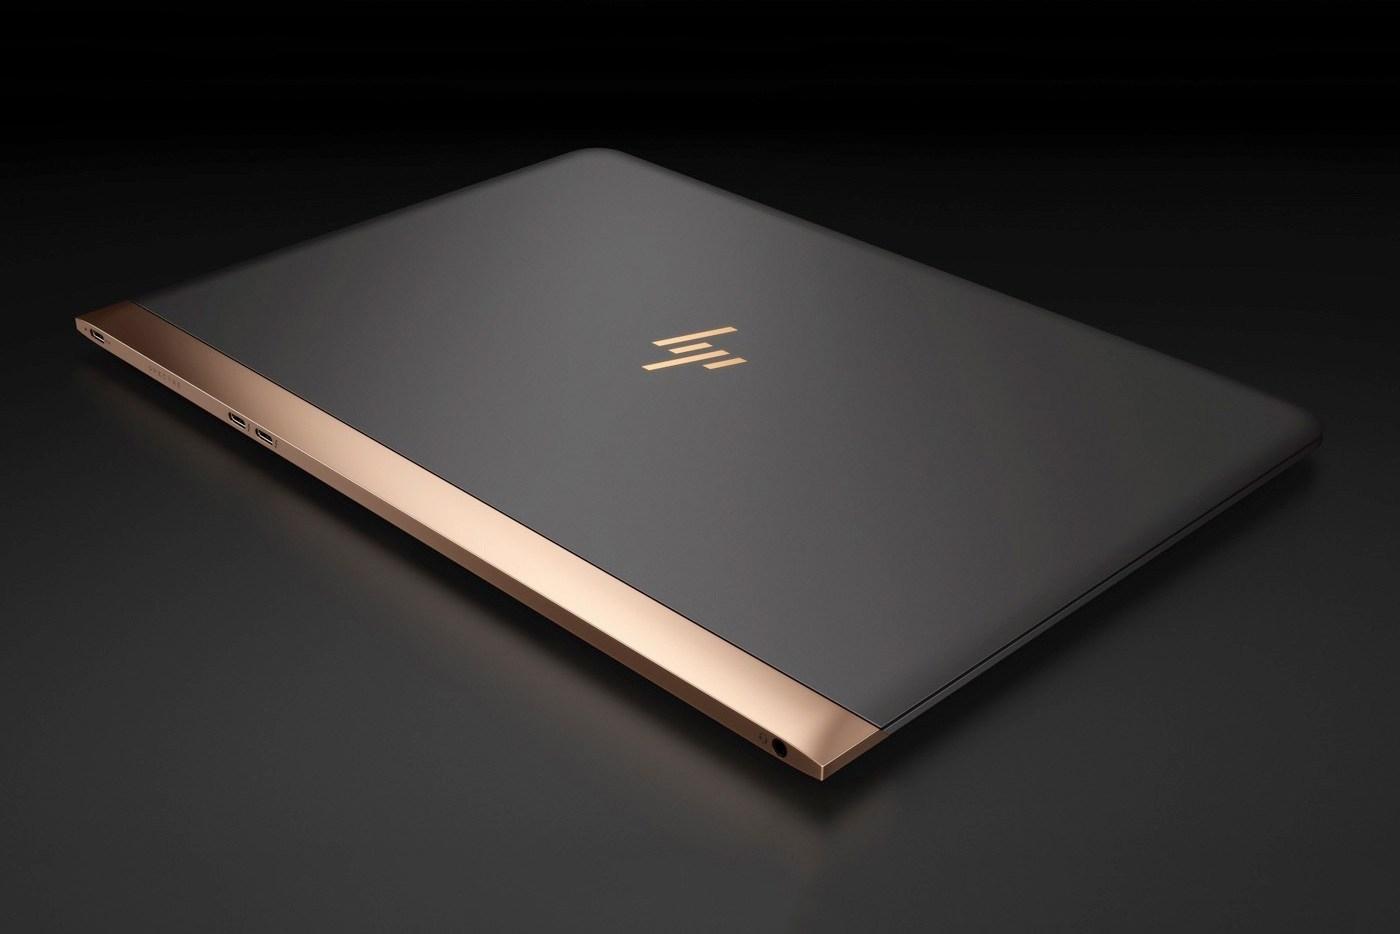 hp-spectre-worlds-thinnest-notebook-4